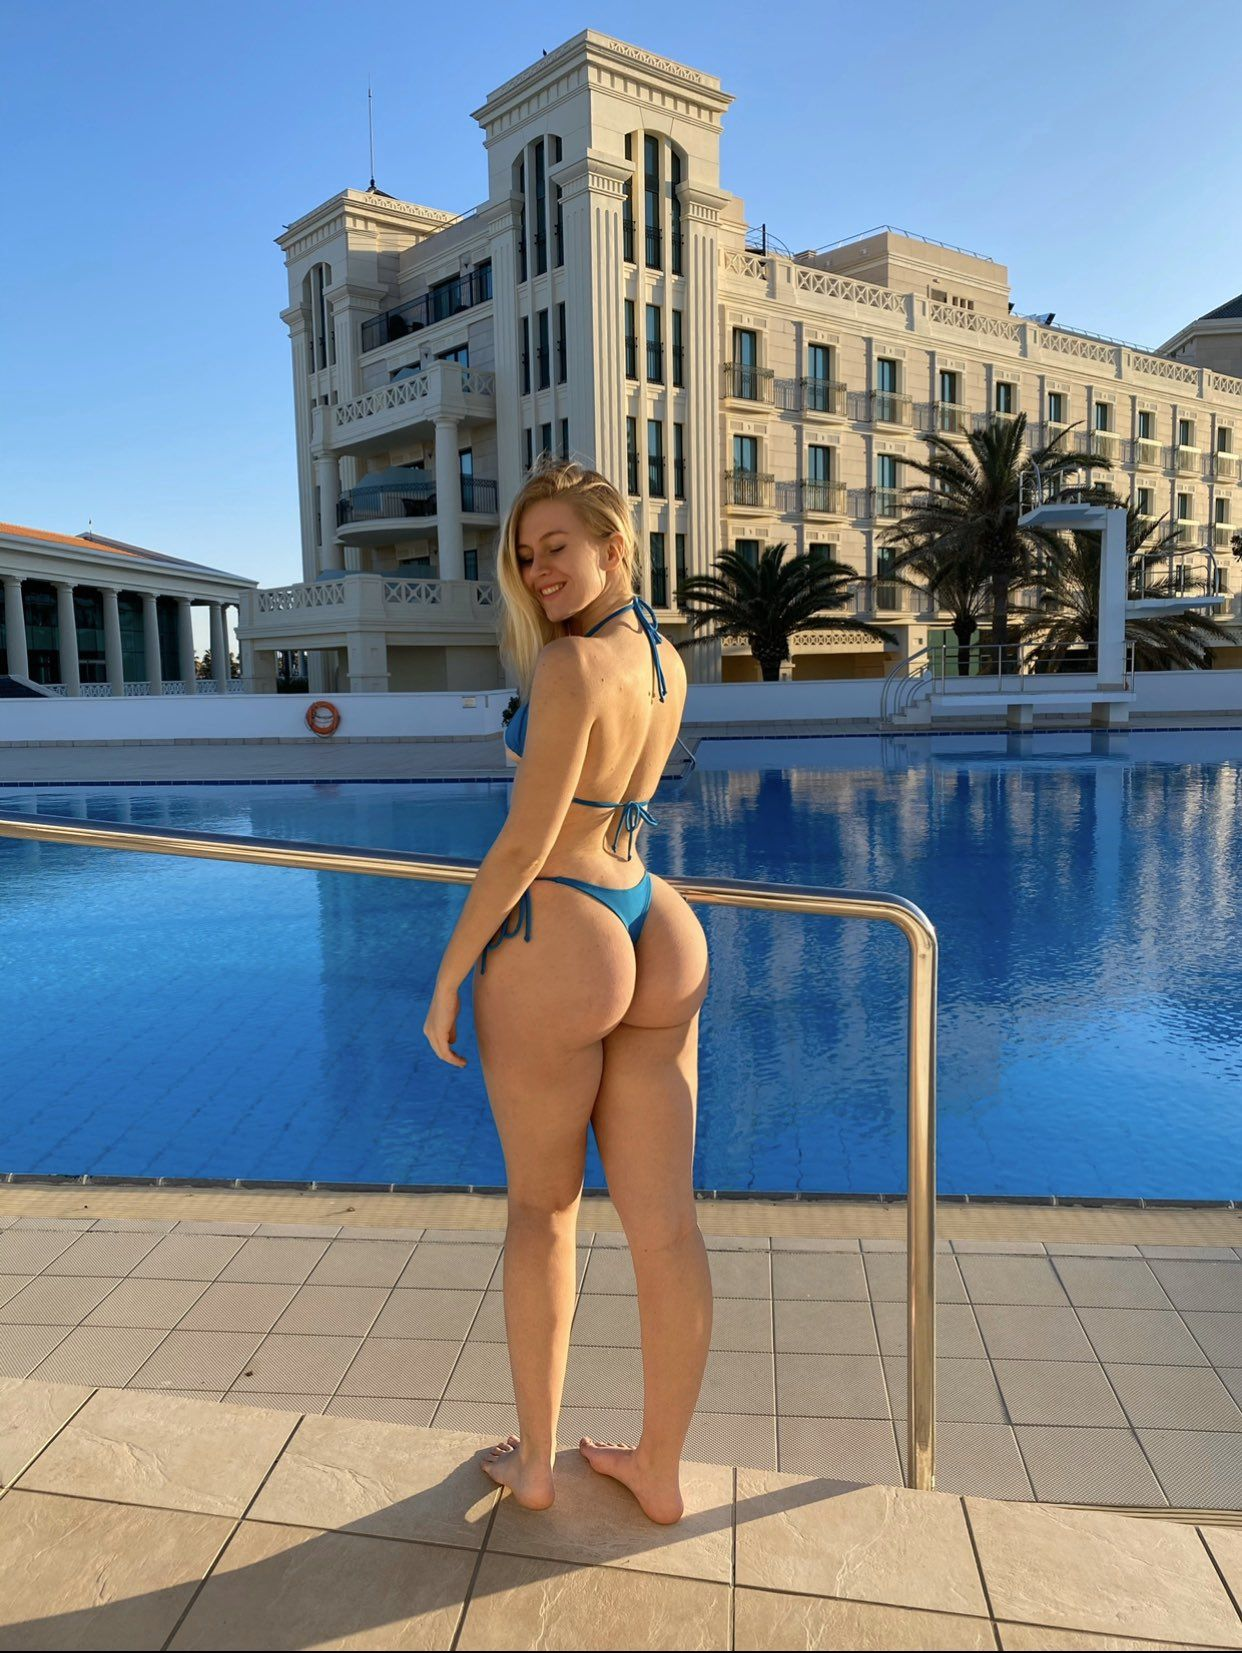 Vera Dijkmans On Twitter In 2020 Bikini Models Bikinis Girl G Vera dijkmans plus size mix fashion stylish pose image credit @veradijkmans/ song: bikini models bikinis